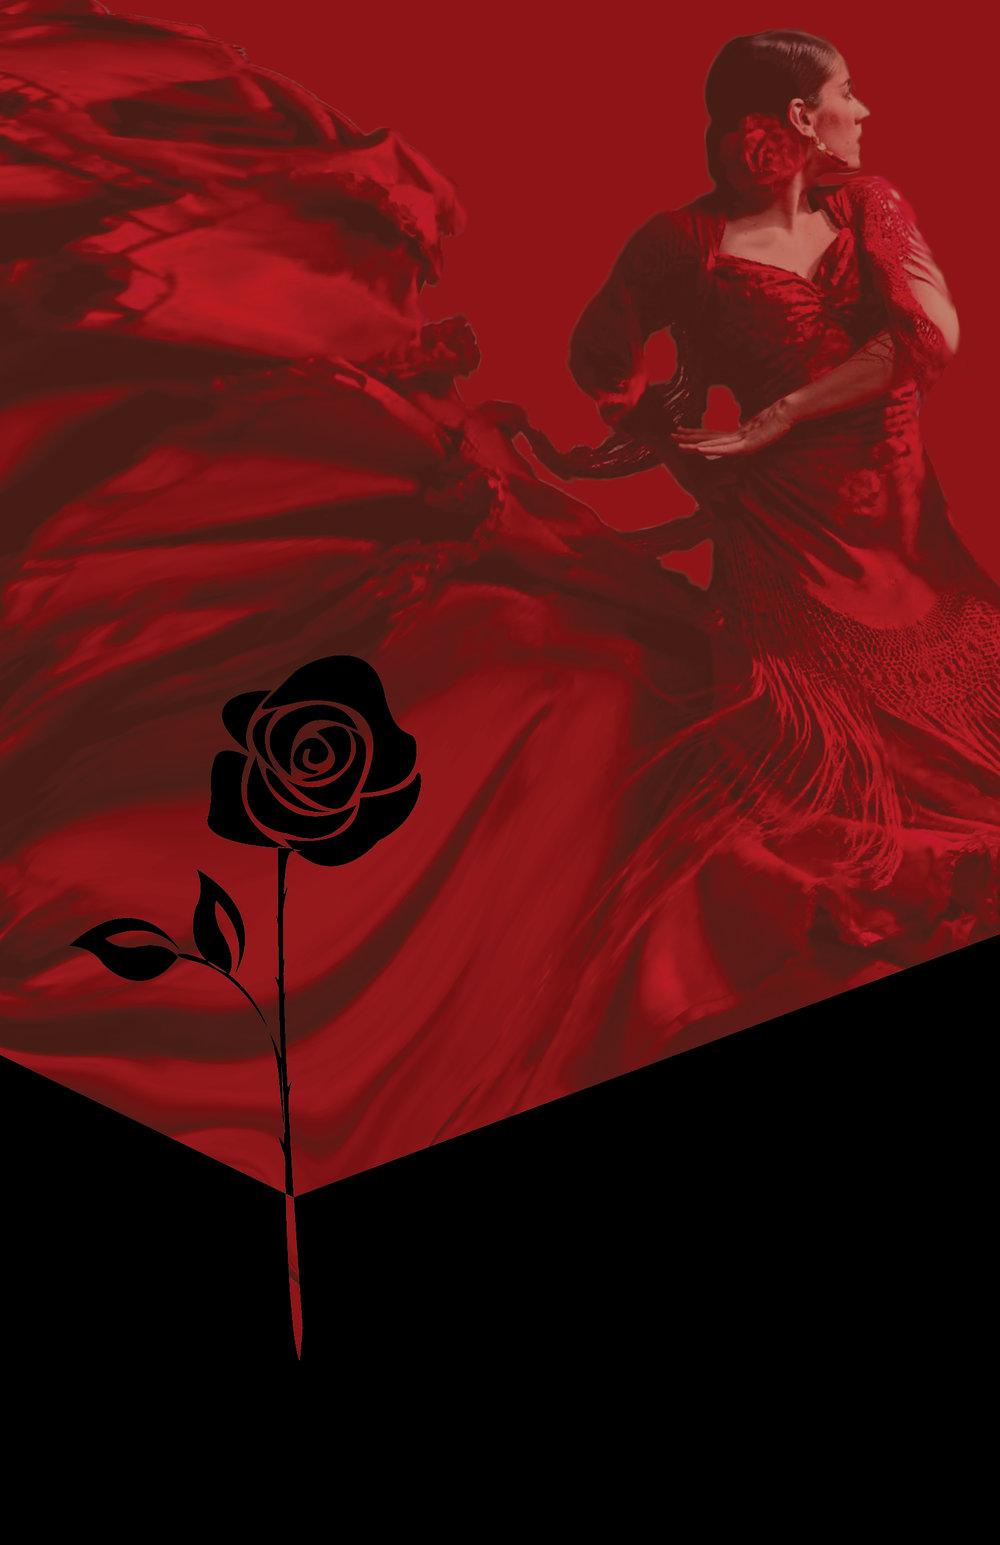 La Tragedie de Carmen - May 2019